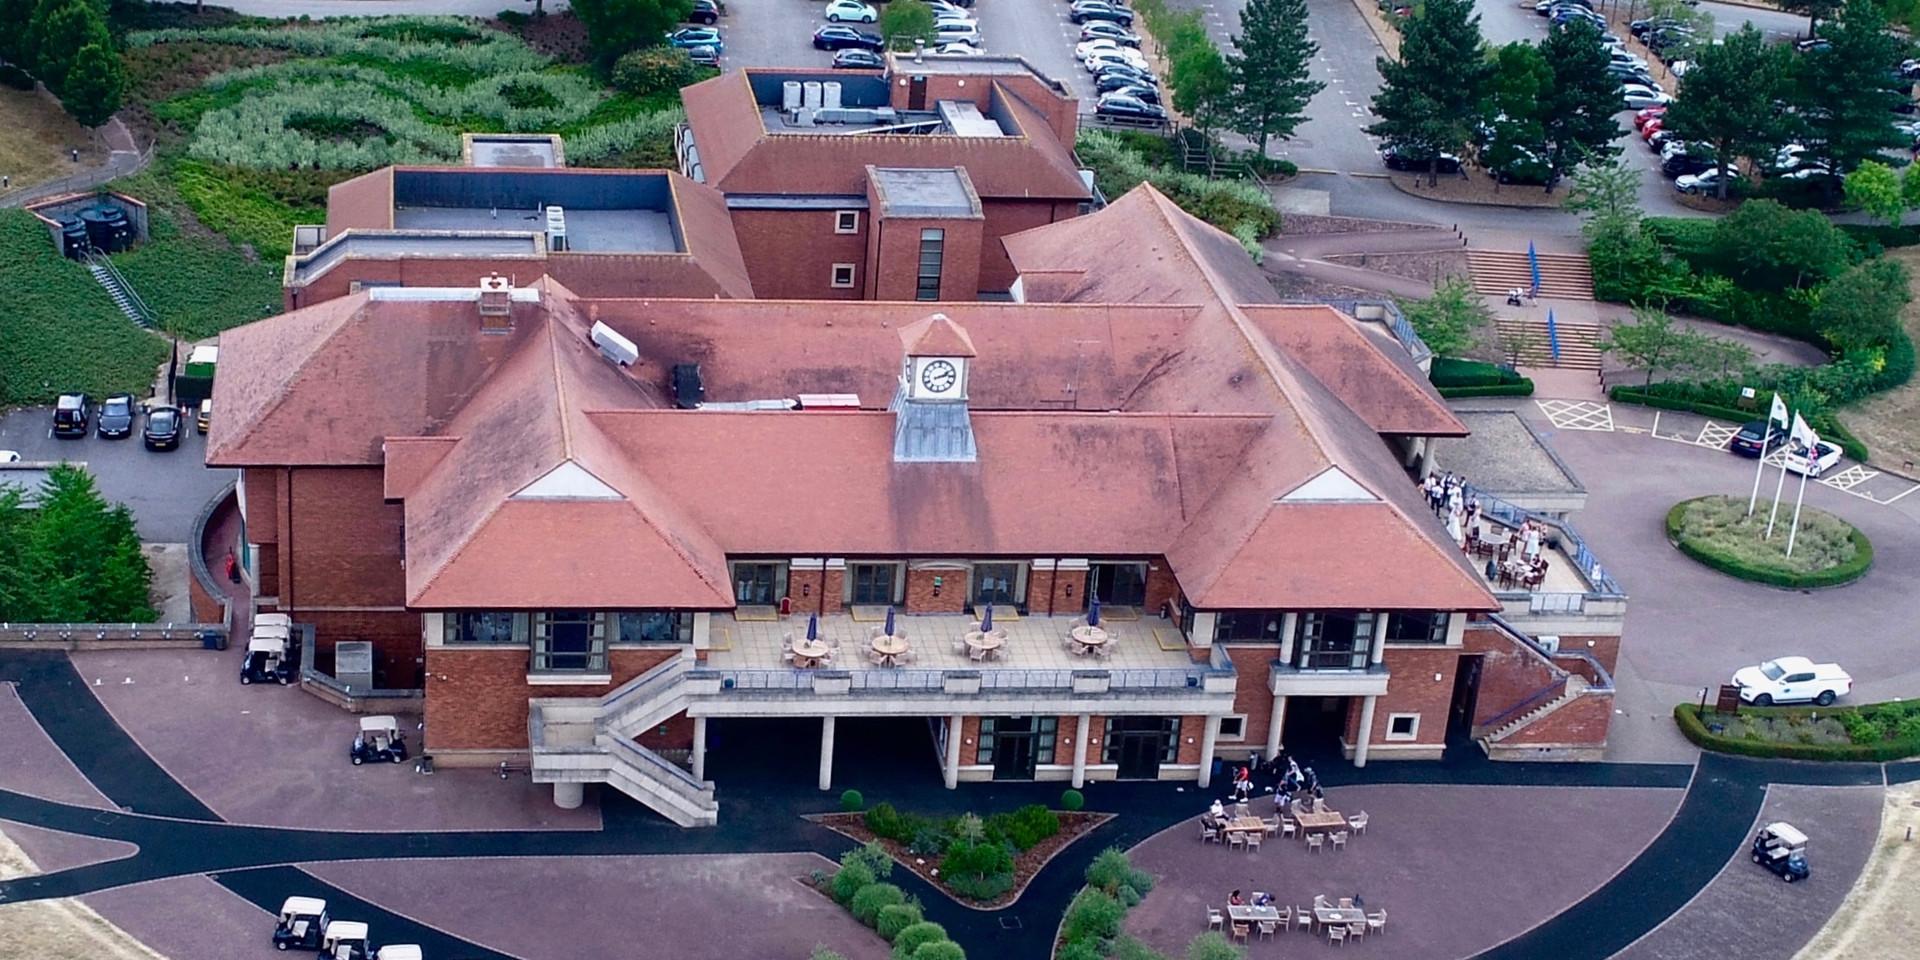 Oxfordshire Golf club and Hotel